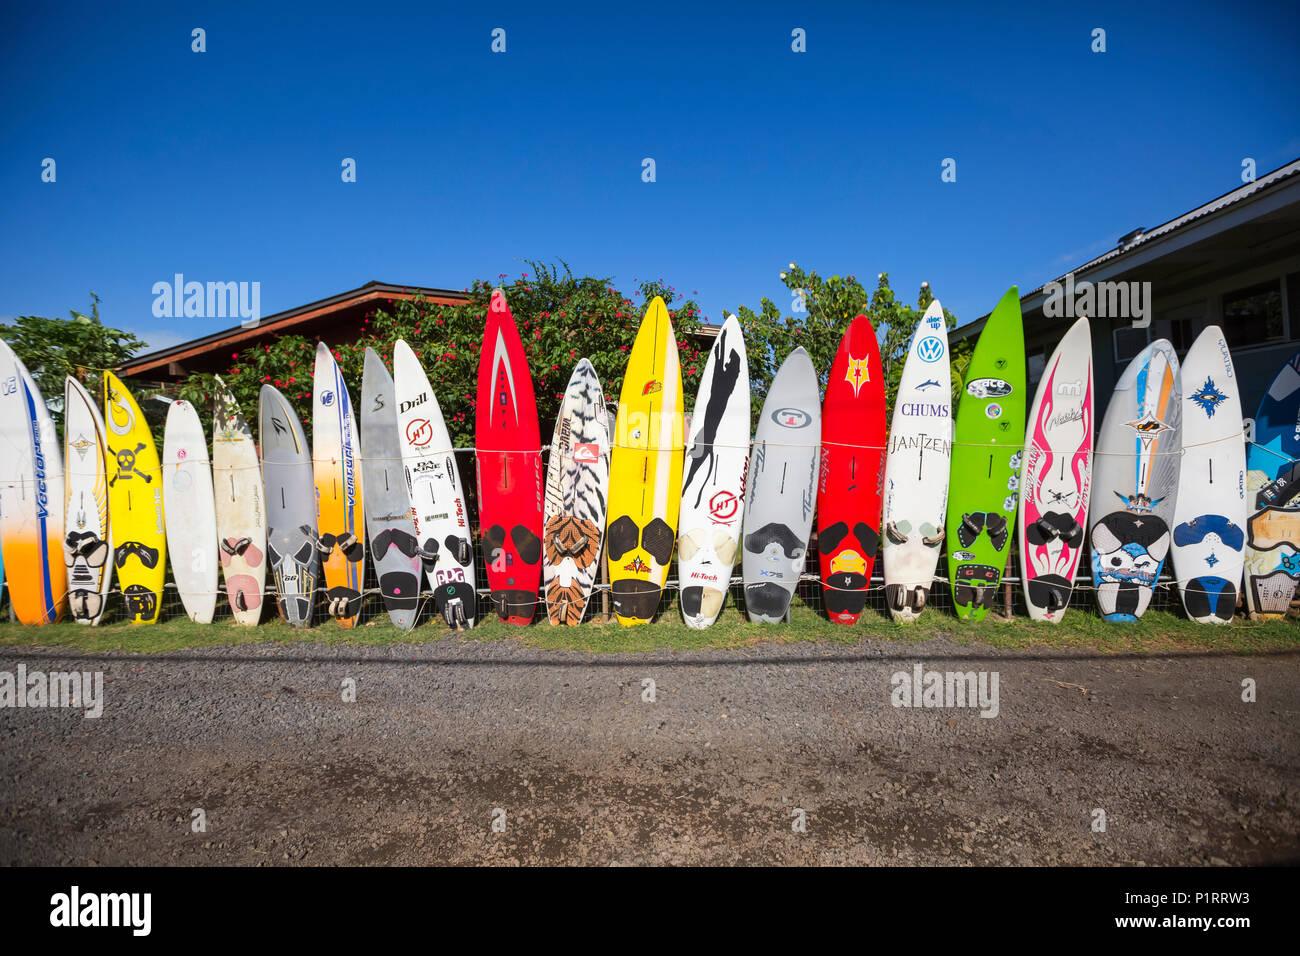 Old Surfboards Make For A Creative Fence Paia Maui Hawaii United